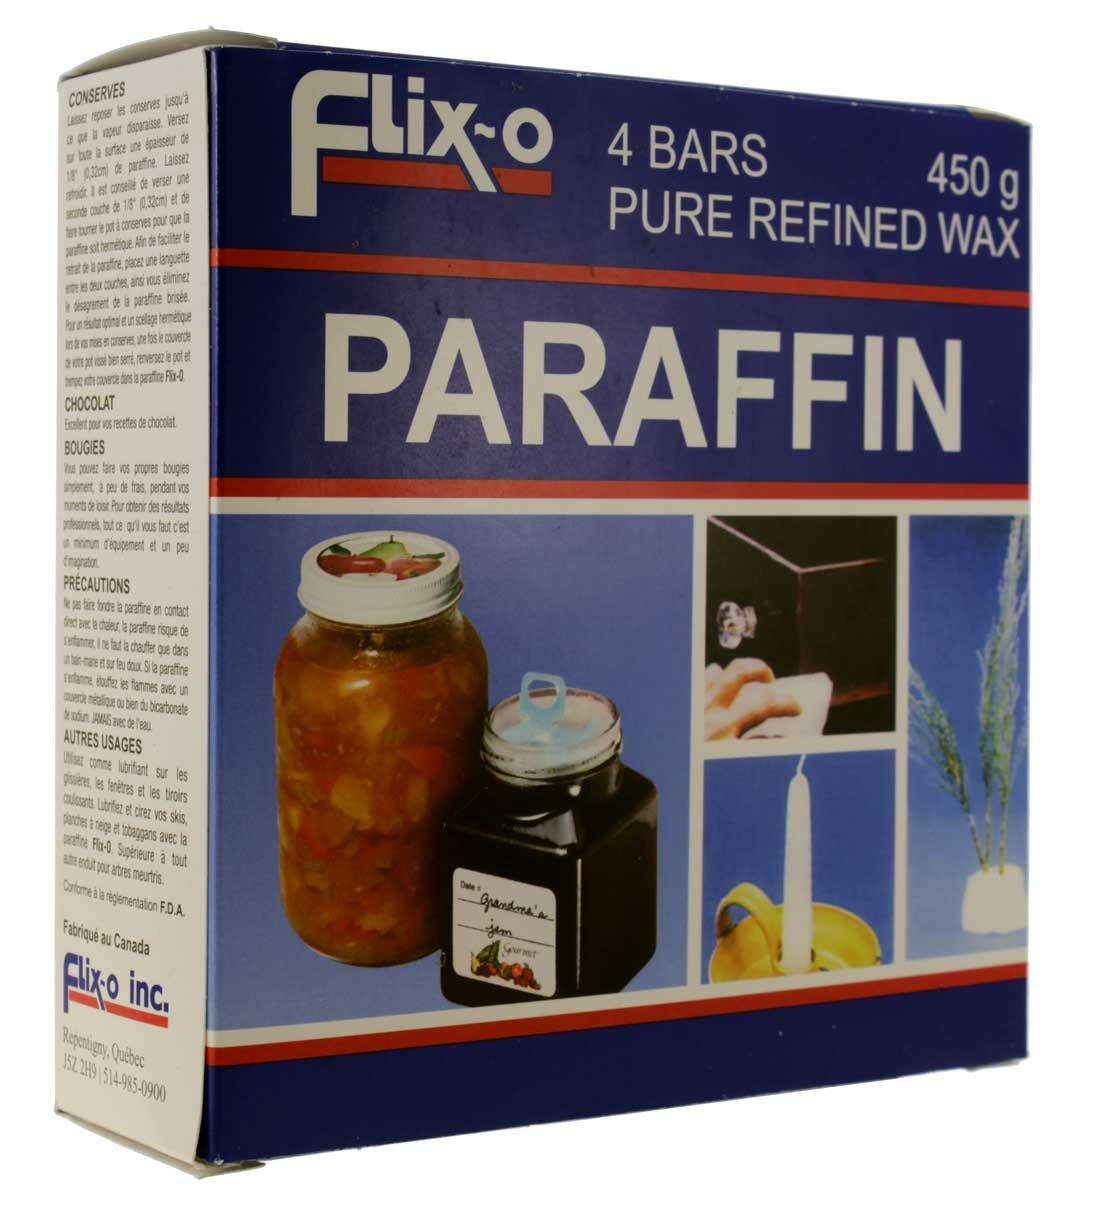 Flix-O Pure Refined Parafin Wax 4 bars 4 barres 450g // Flix-O cire paraffine pure rafin/ée 450g